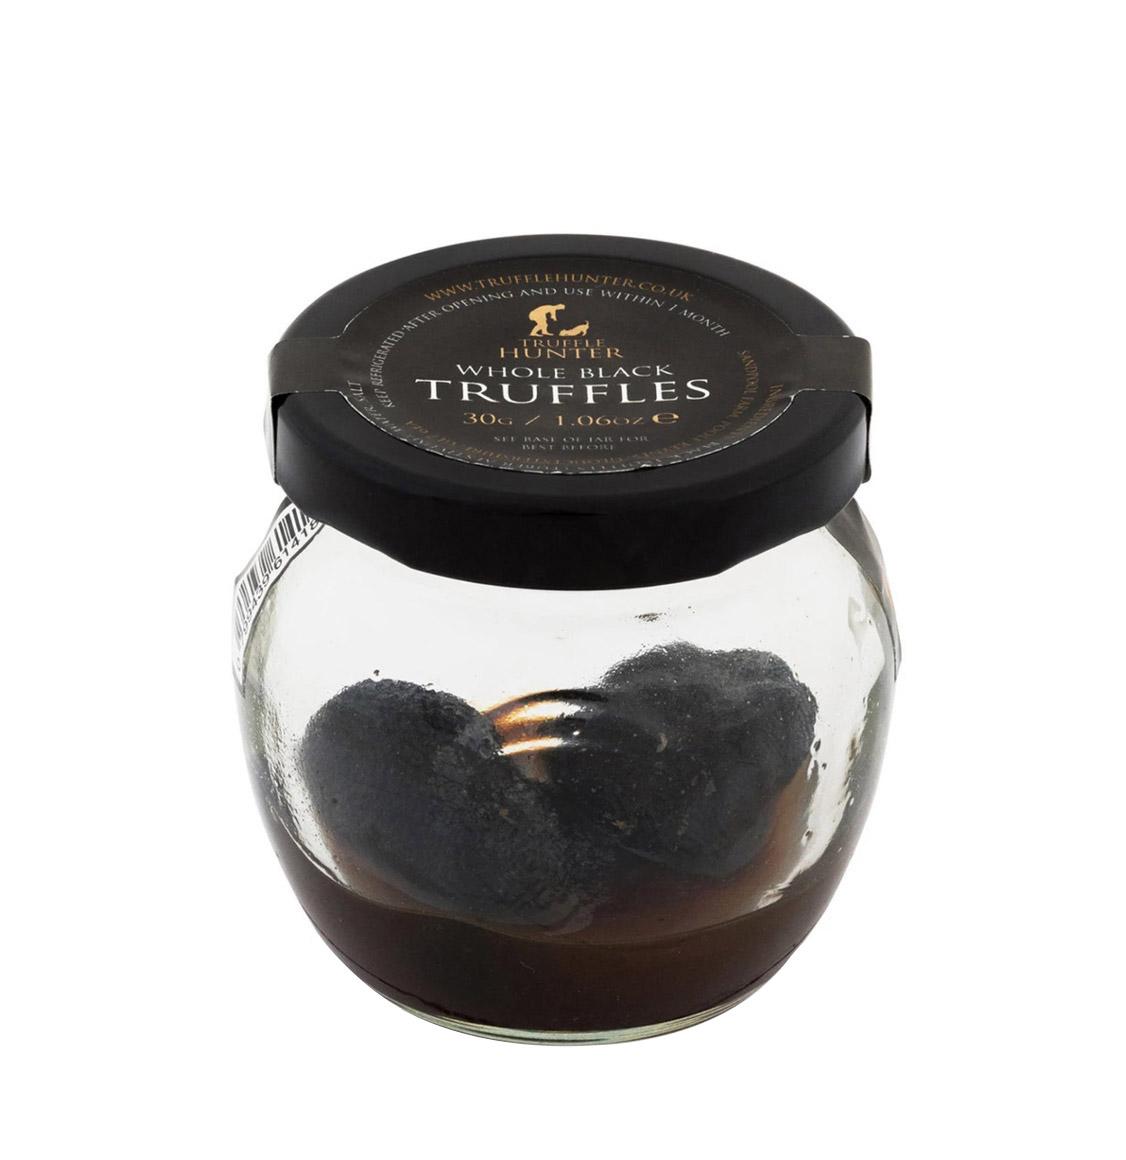 TruffleHunter Ολόκληρες Μαύρες Τρούφες Whole Black Truffles 30g